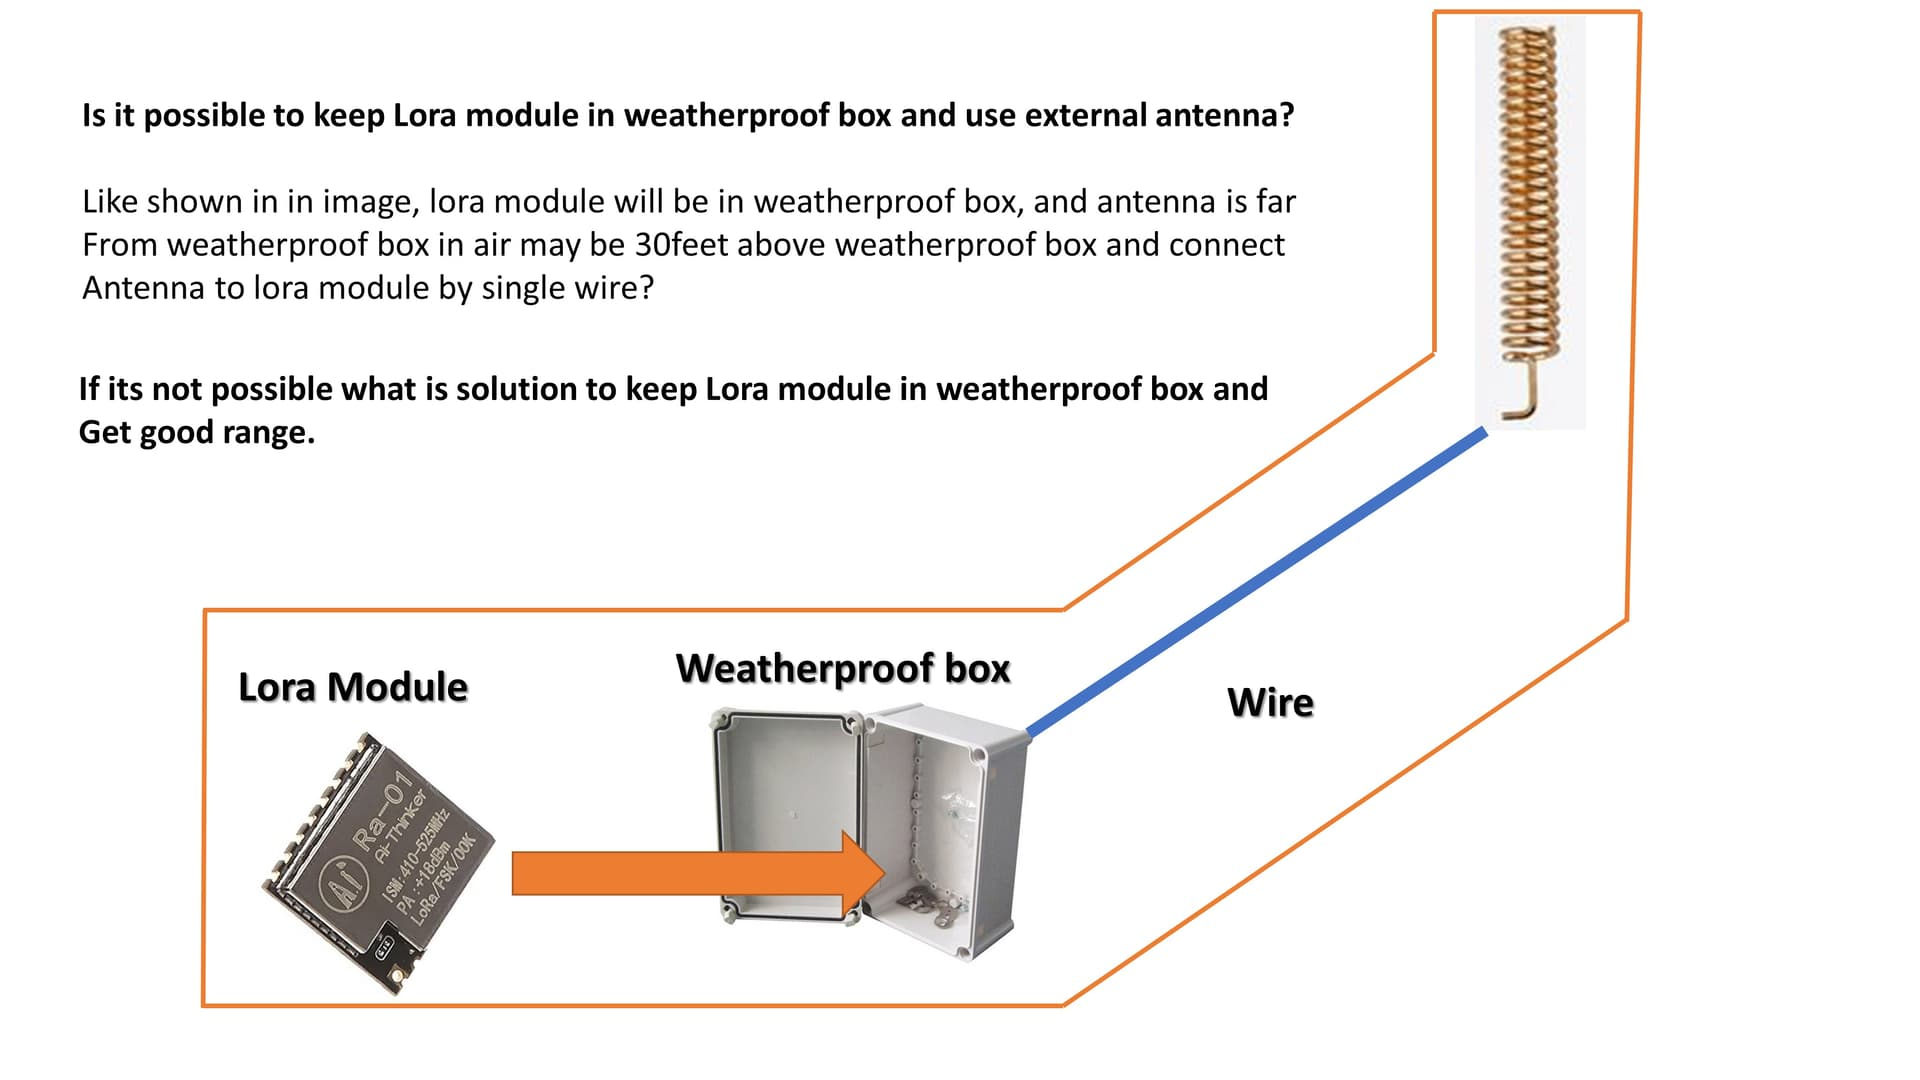 Lora module in weatherproof box